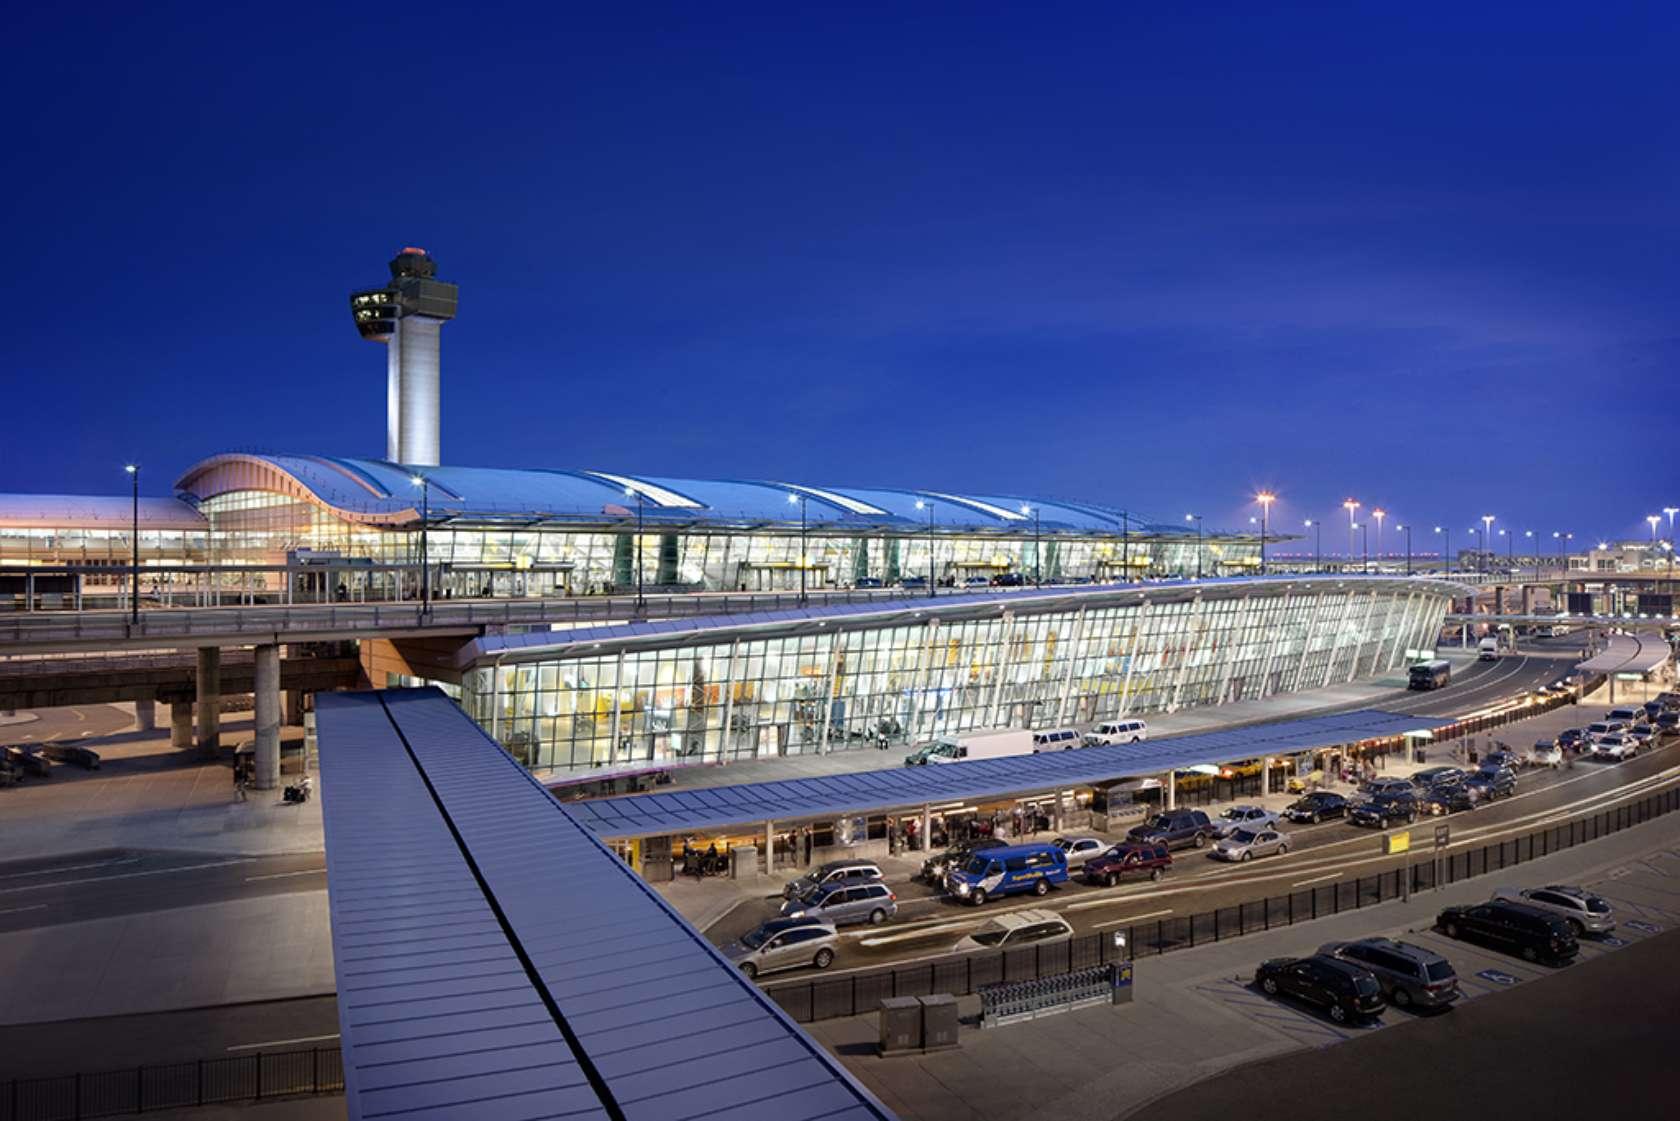 John-F.-Kennedy-International-Airport